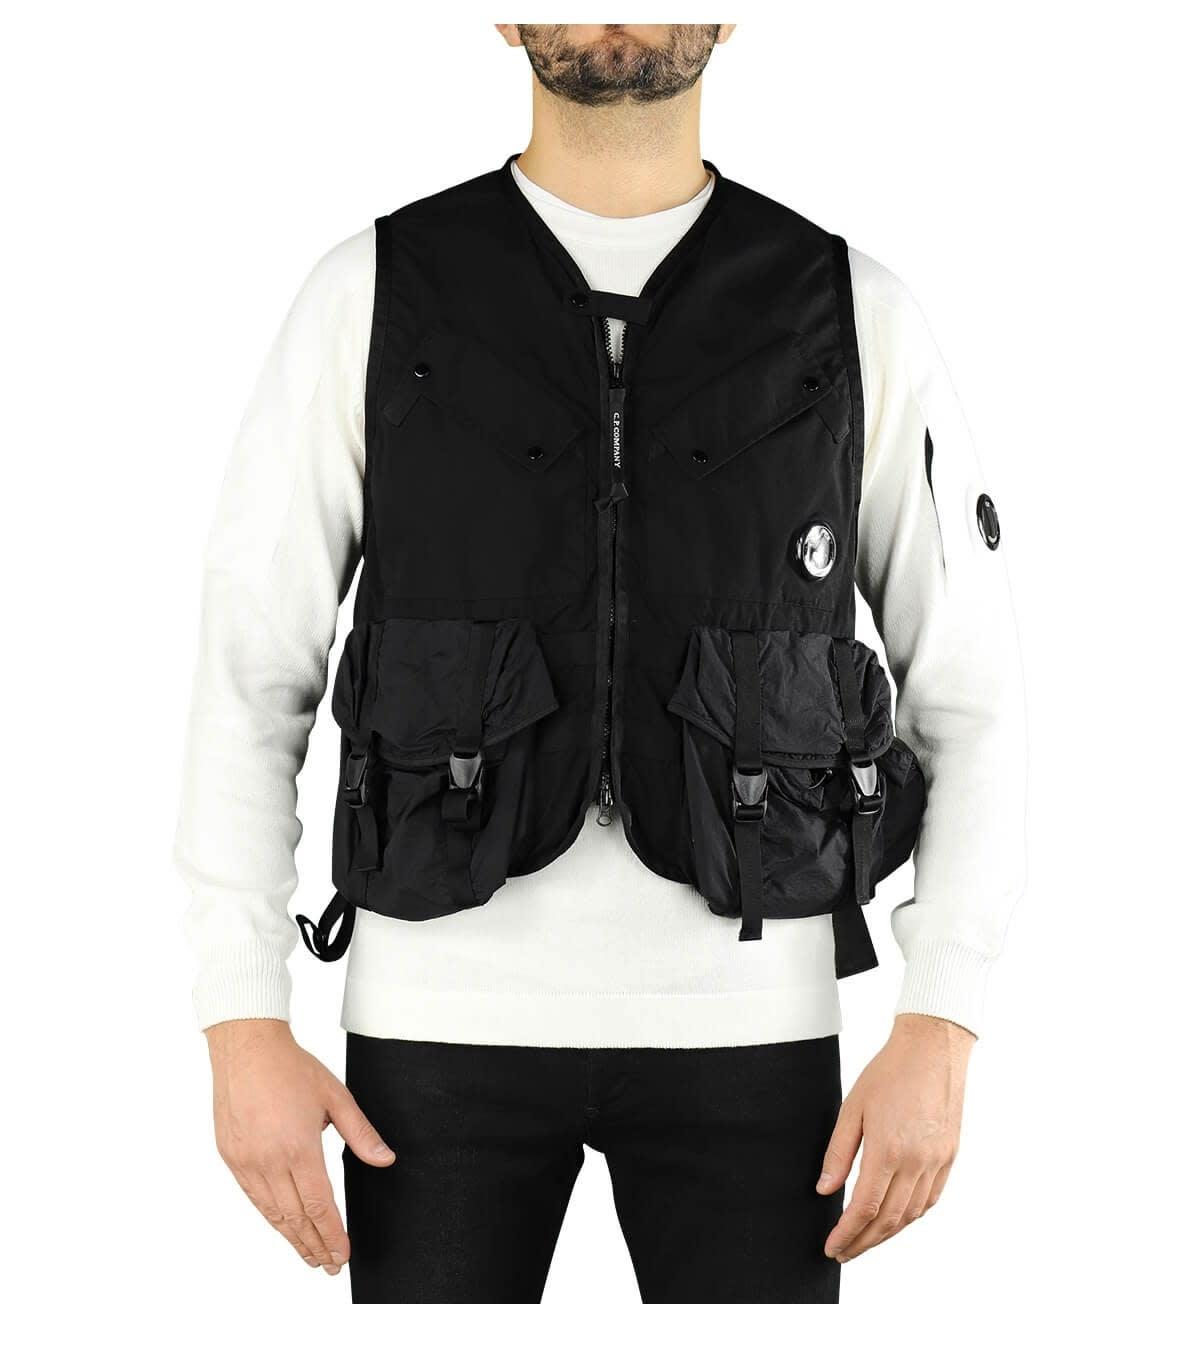 C.p. Company Vests C.P. COMPANY TAYLON P BLACK VEST